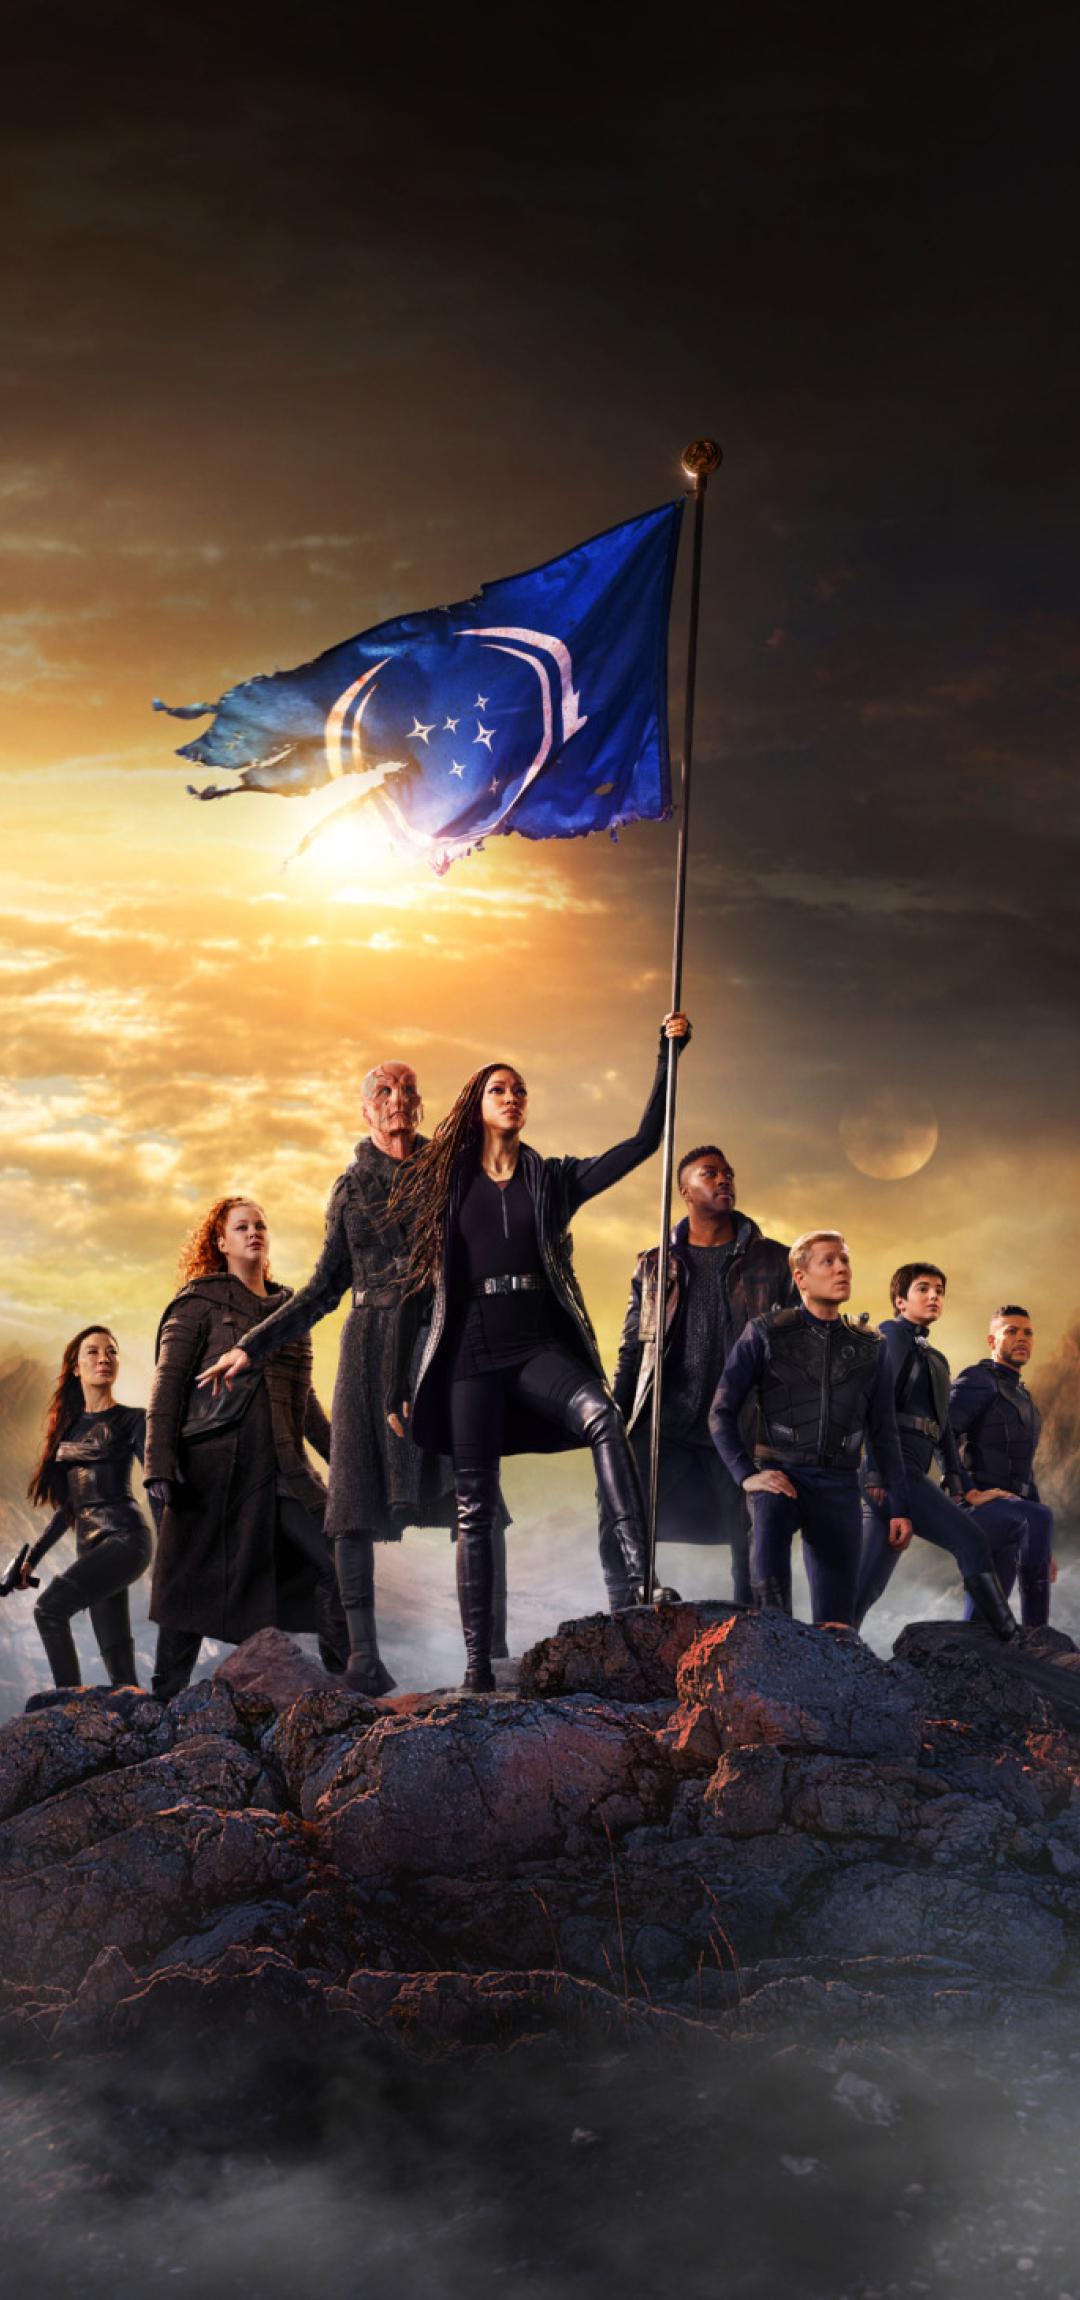 1080x2300 Star Trek Discovery Season 3 1080x2300 ...